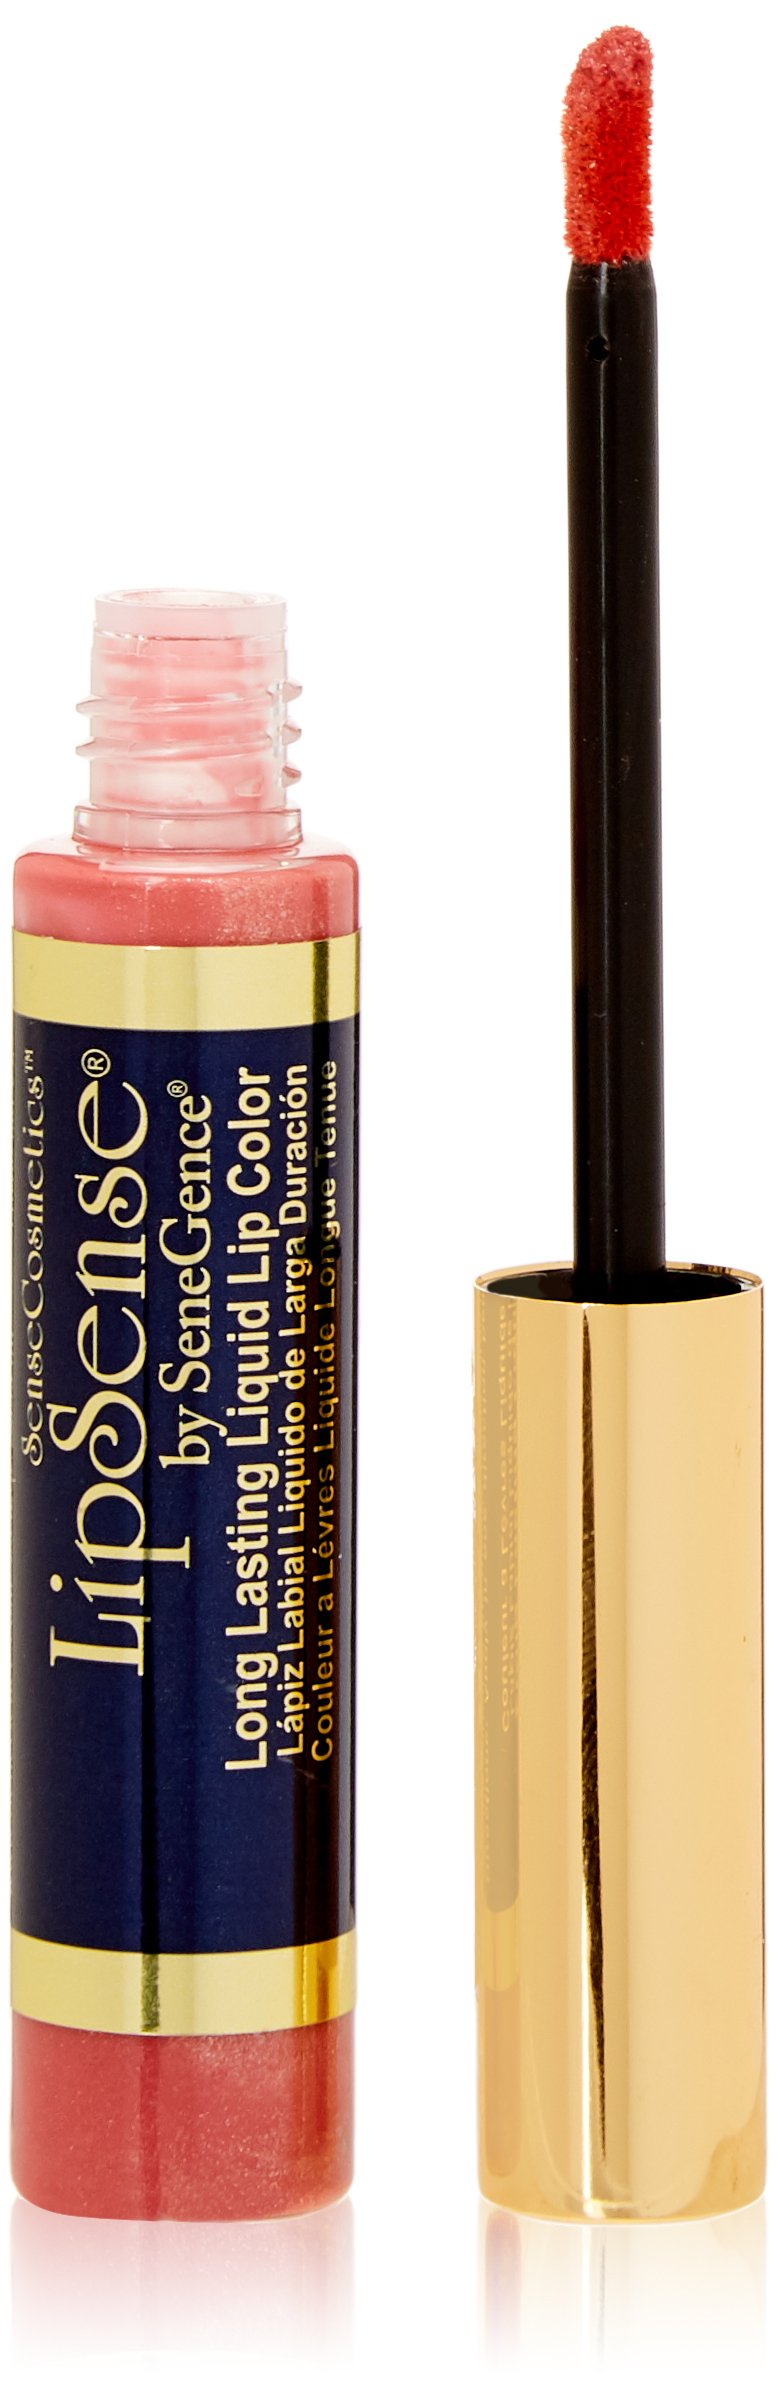 LipSense Liquid Lip Color, Aussie Rose, 0.25 fl oz / 7.4 ml